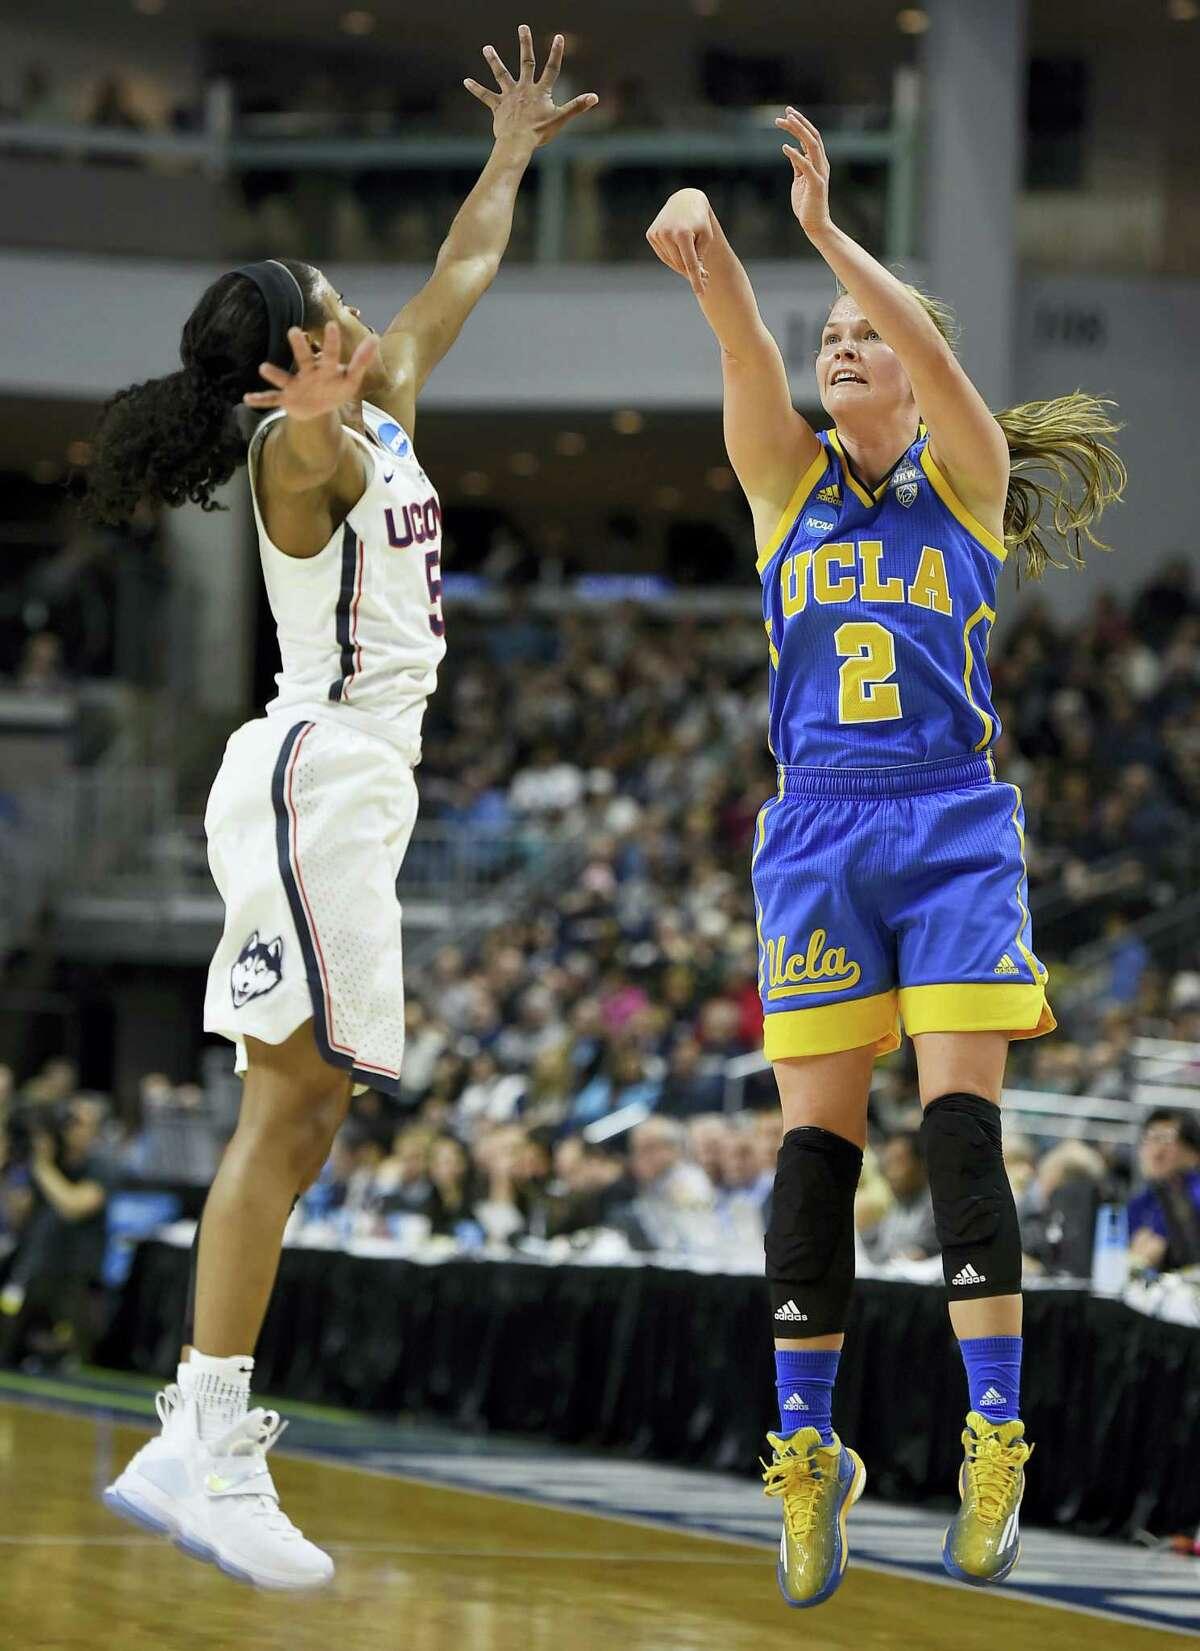 UCLA's Kari Korver follows through on 3-point basket as UConn's Crystal Dangerfield defends on Saturday.